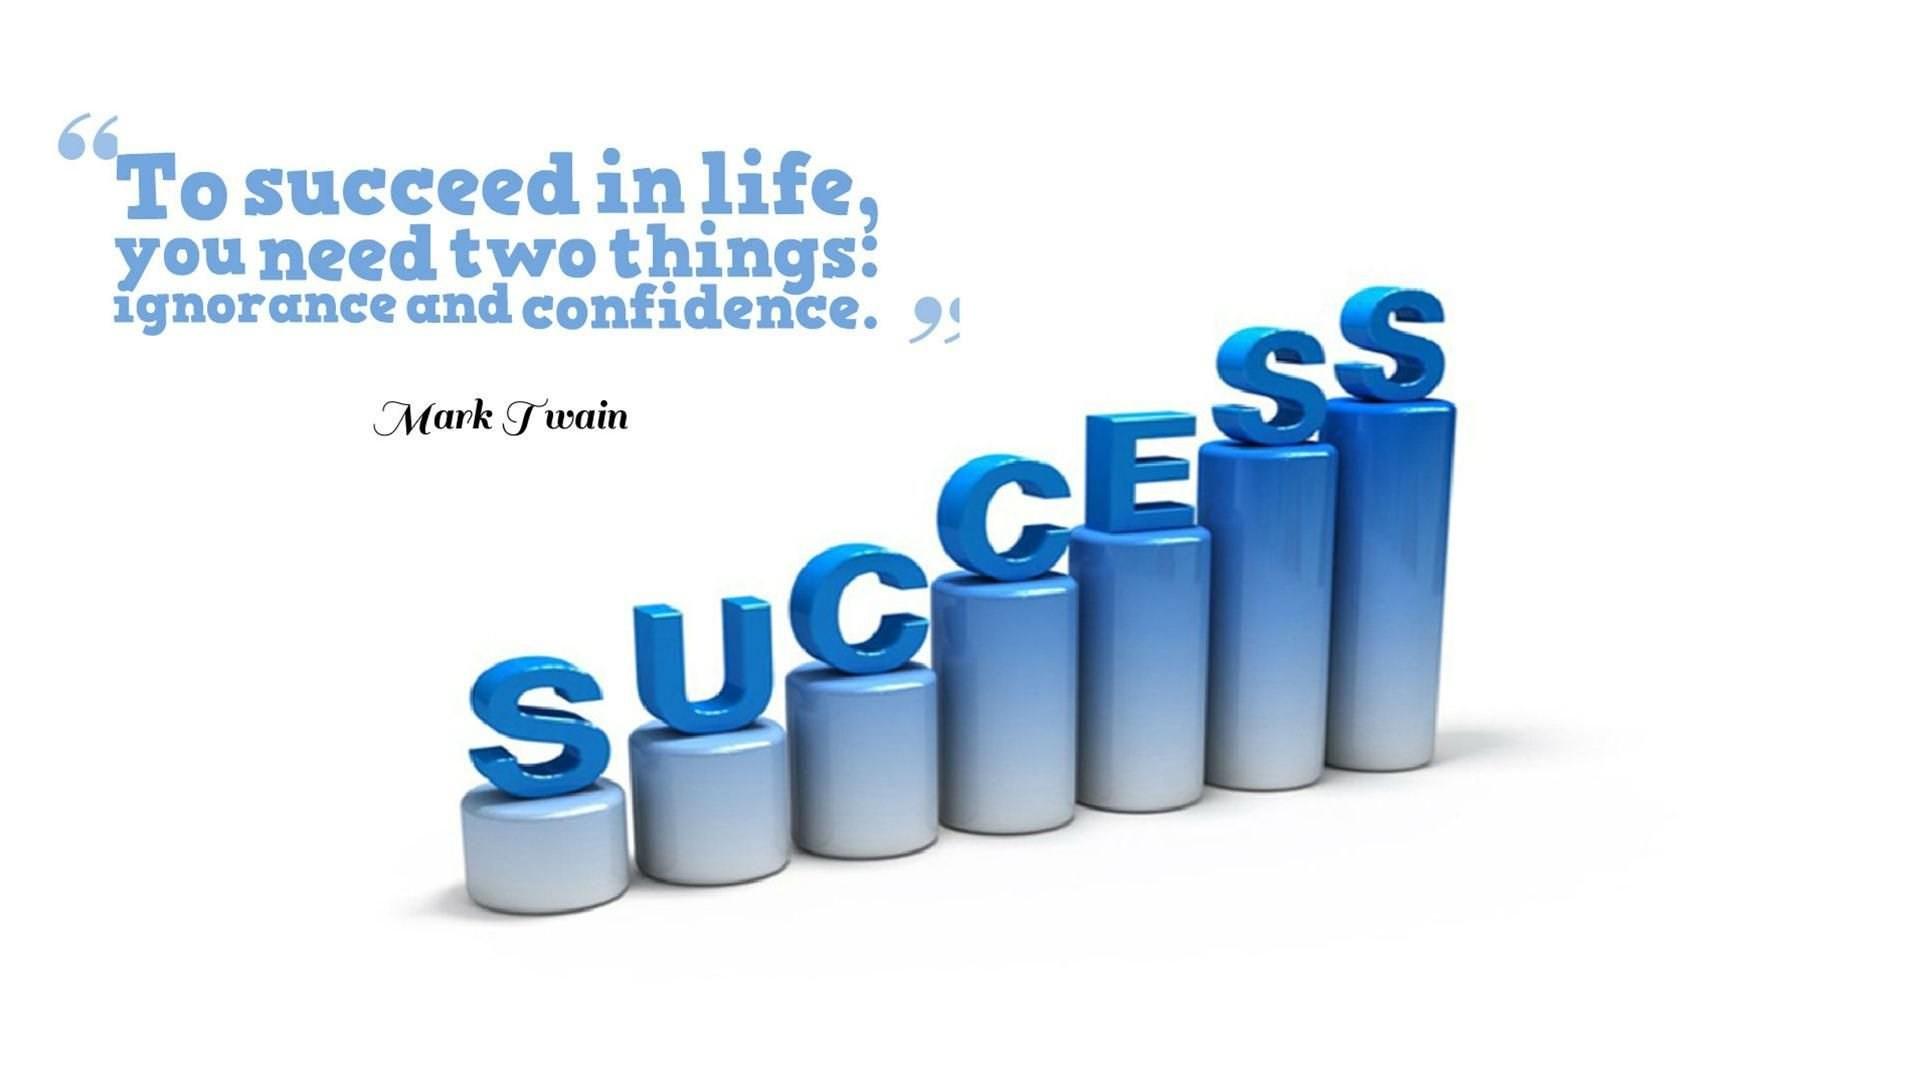 Success Quotes Wallpapers Hd Imgtagram Desktop Background